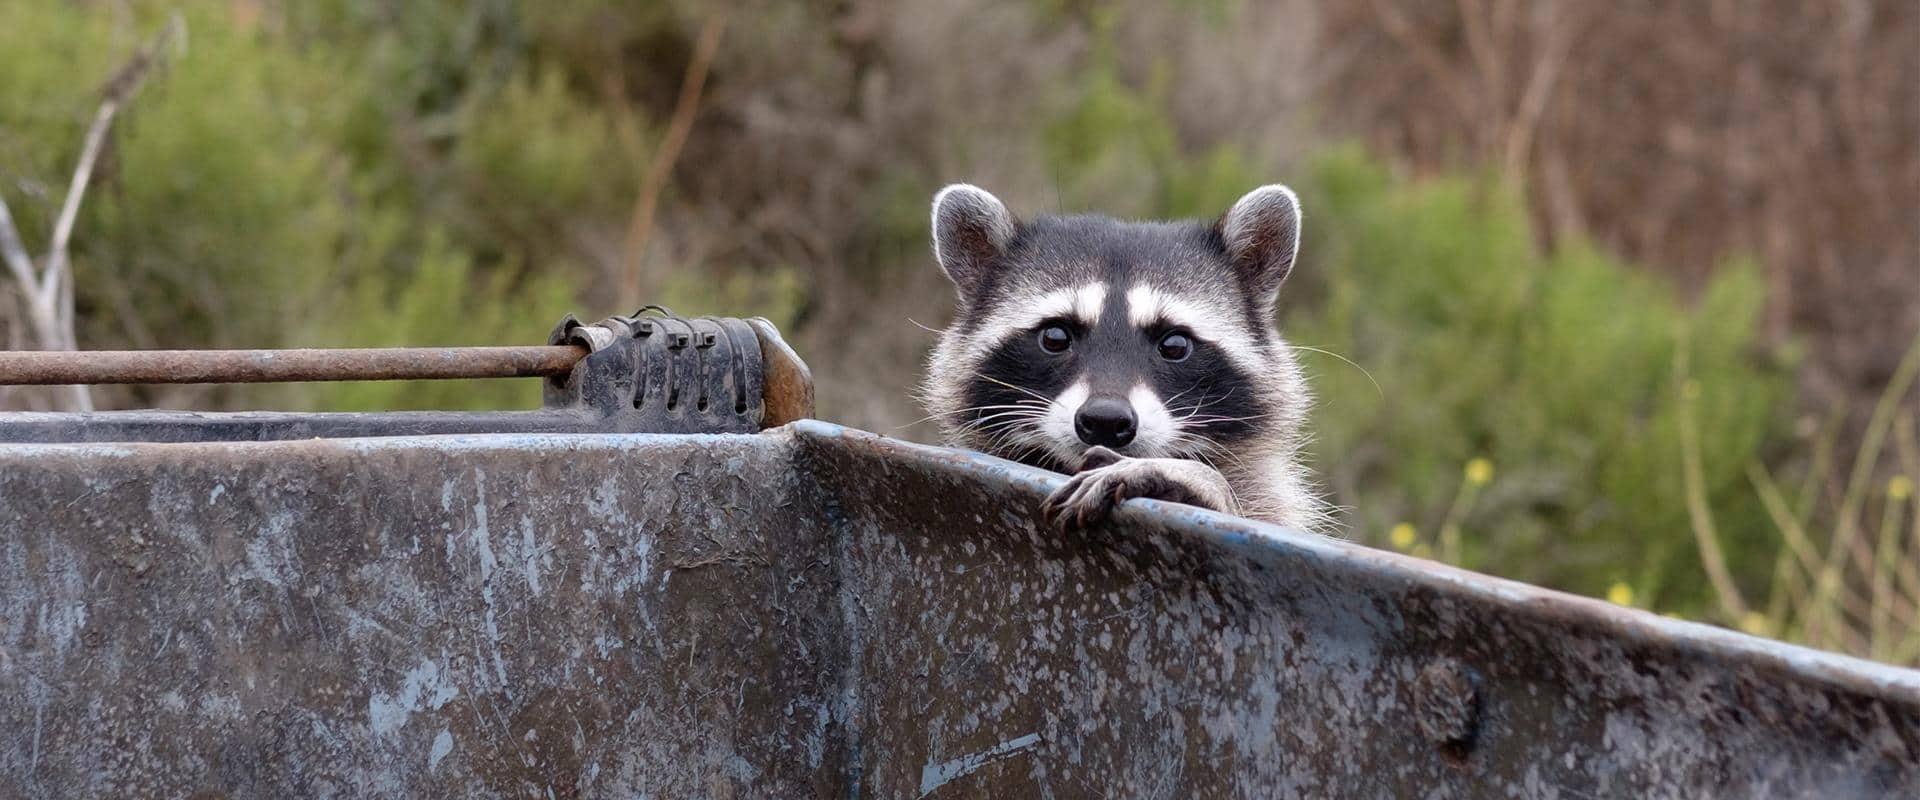 raccoon in dumpster in central washington